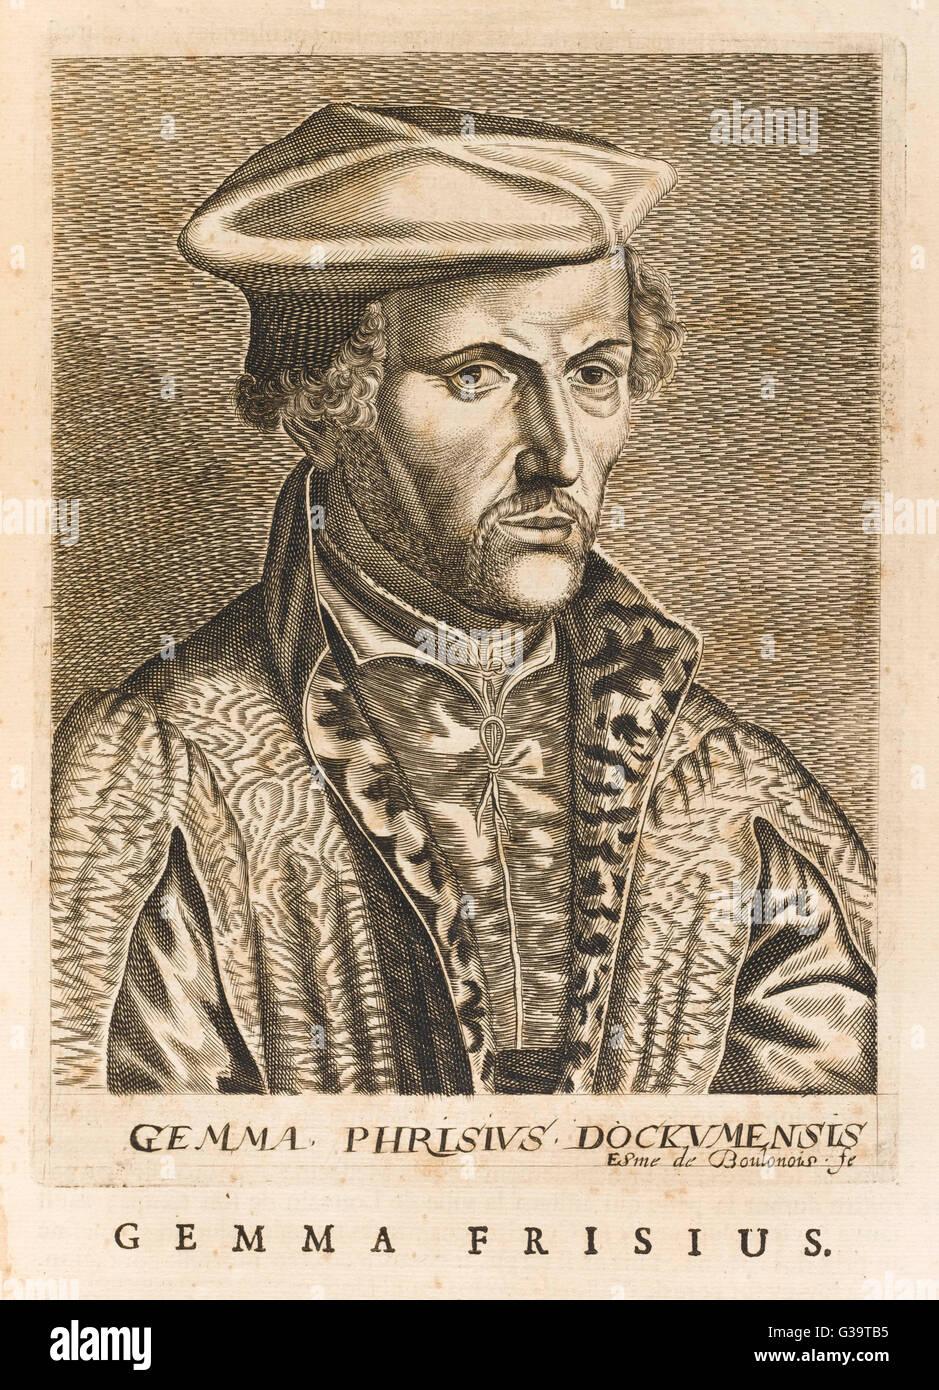 REINIER GEMMA alias FRISIUS  Dutch mathematician and medical      Date: 1508 - 1555 - Stock Image